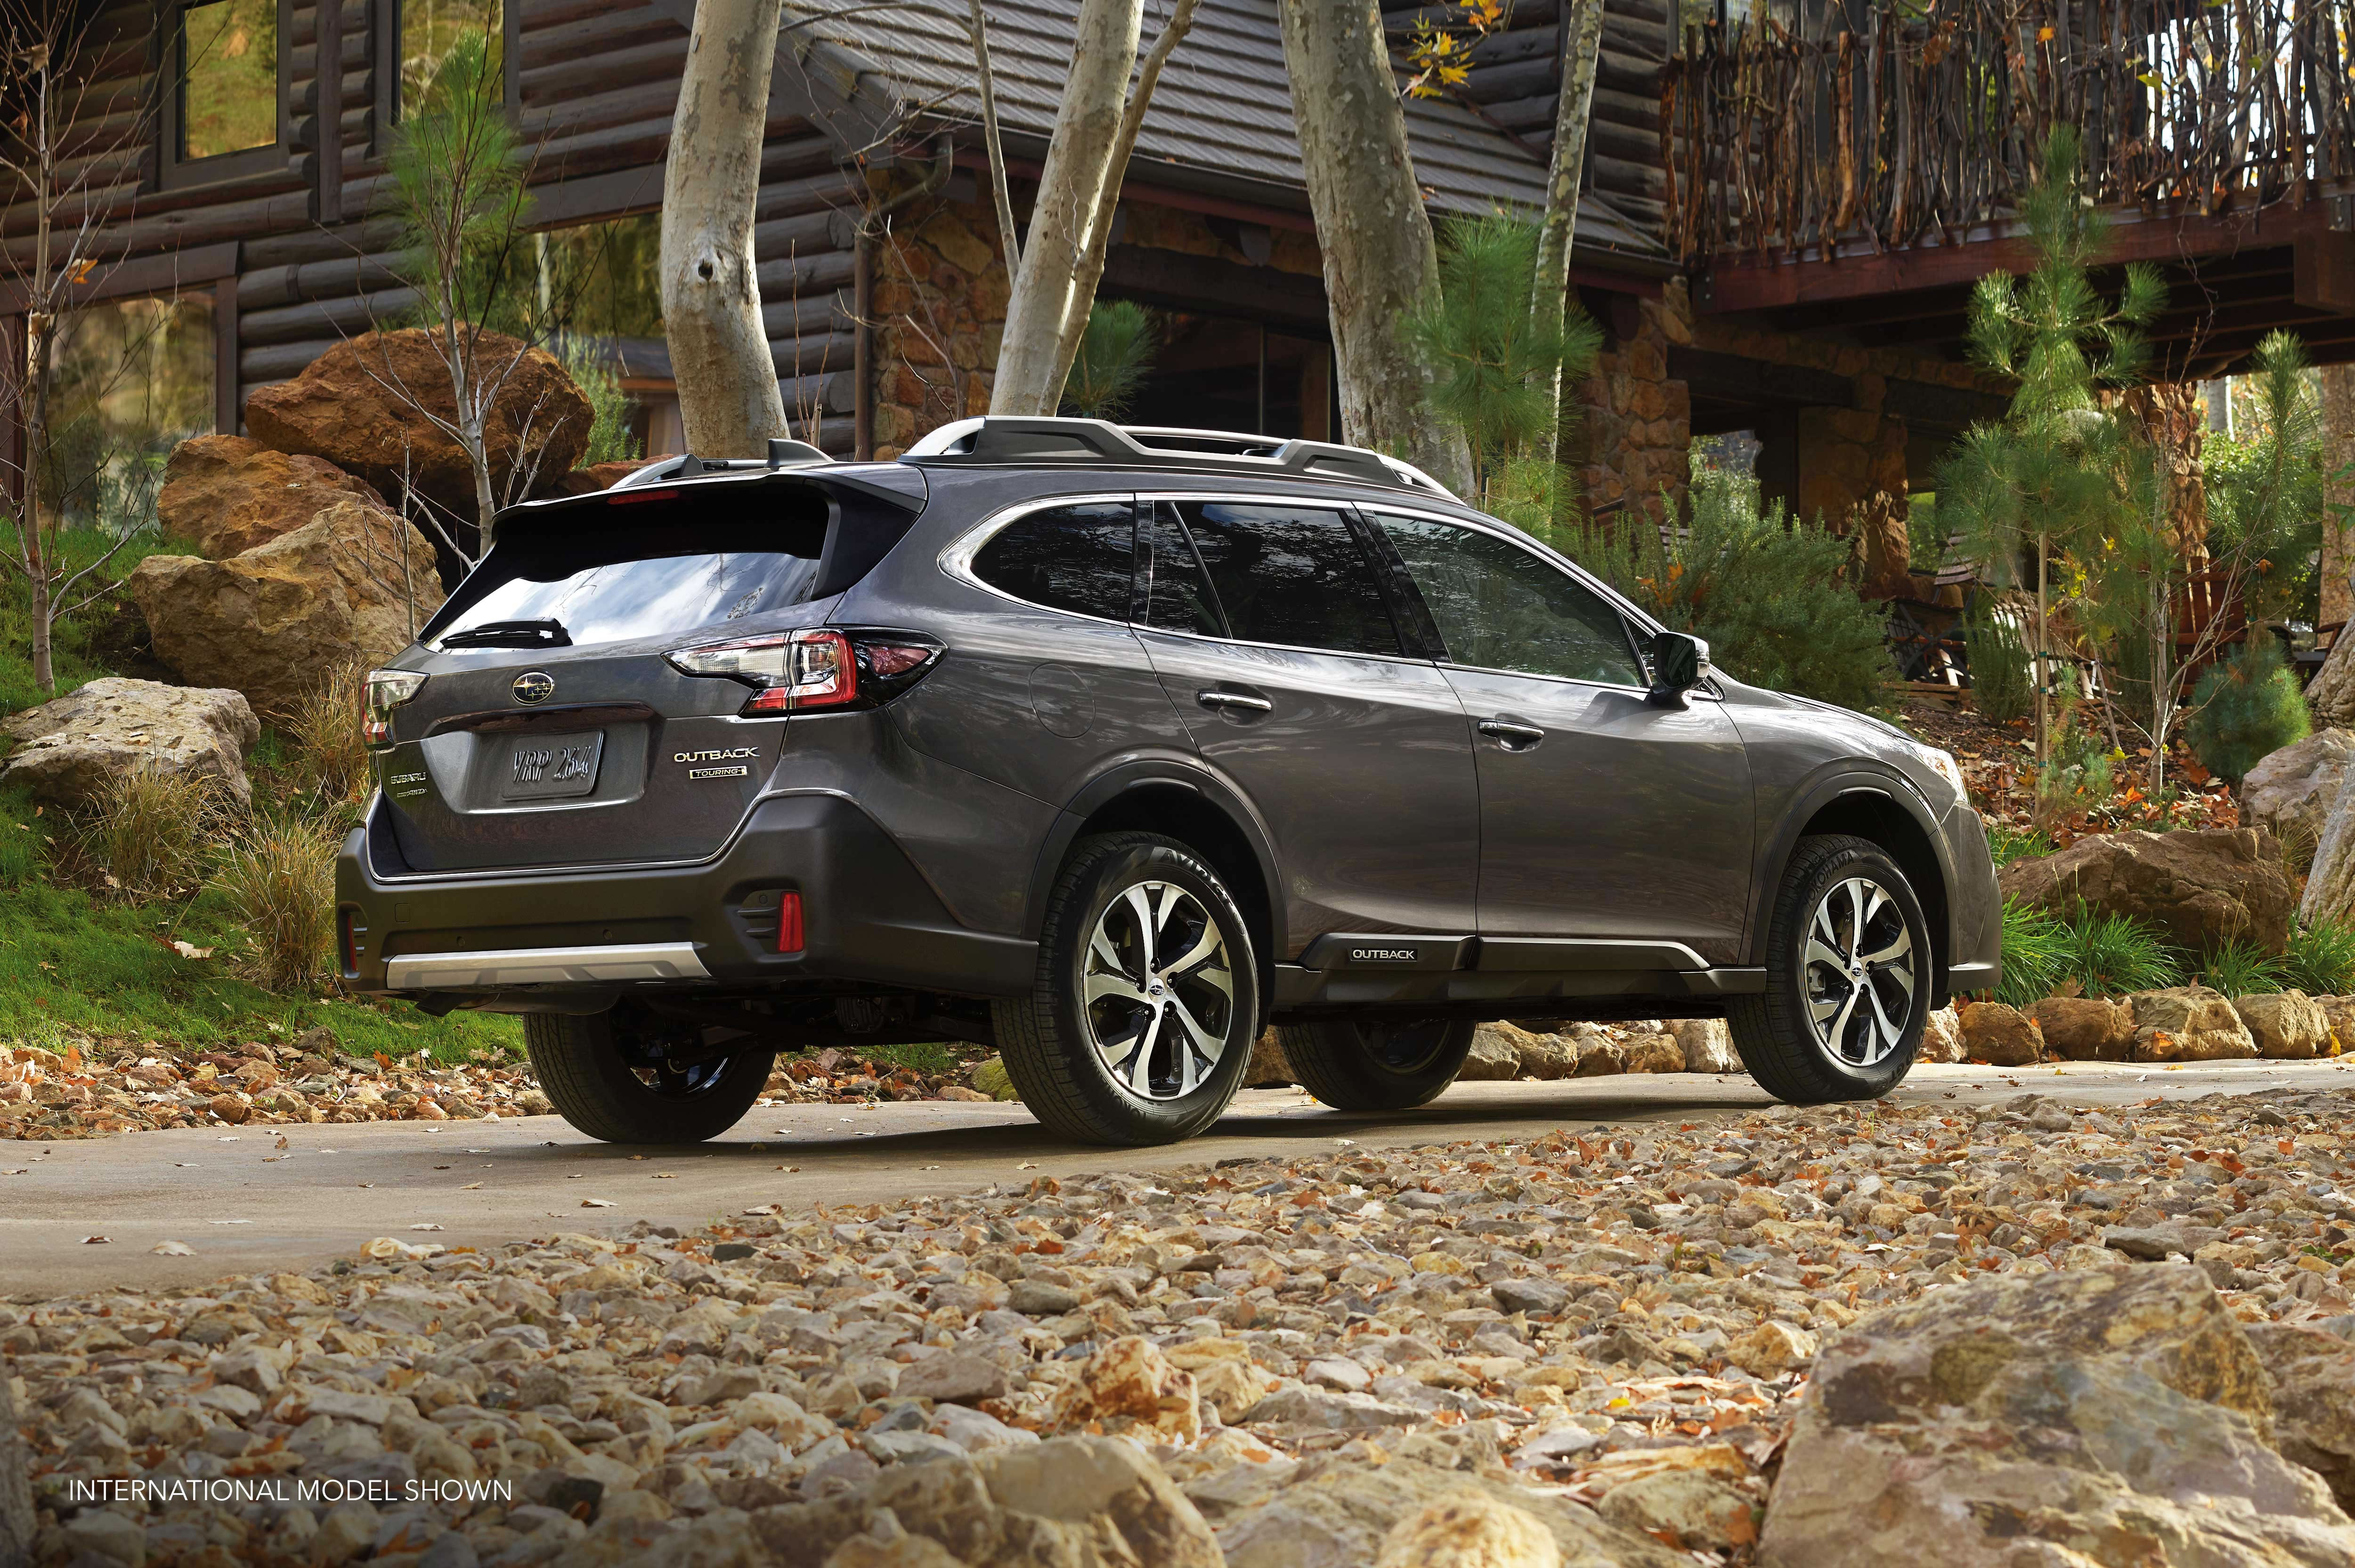 2020 Subaru Outback Subaru Canada Subaru Canada